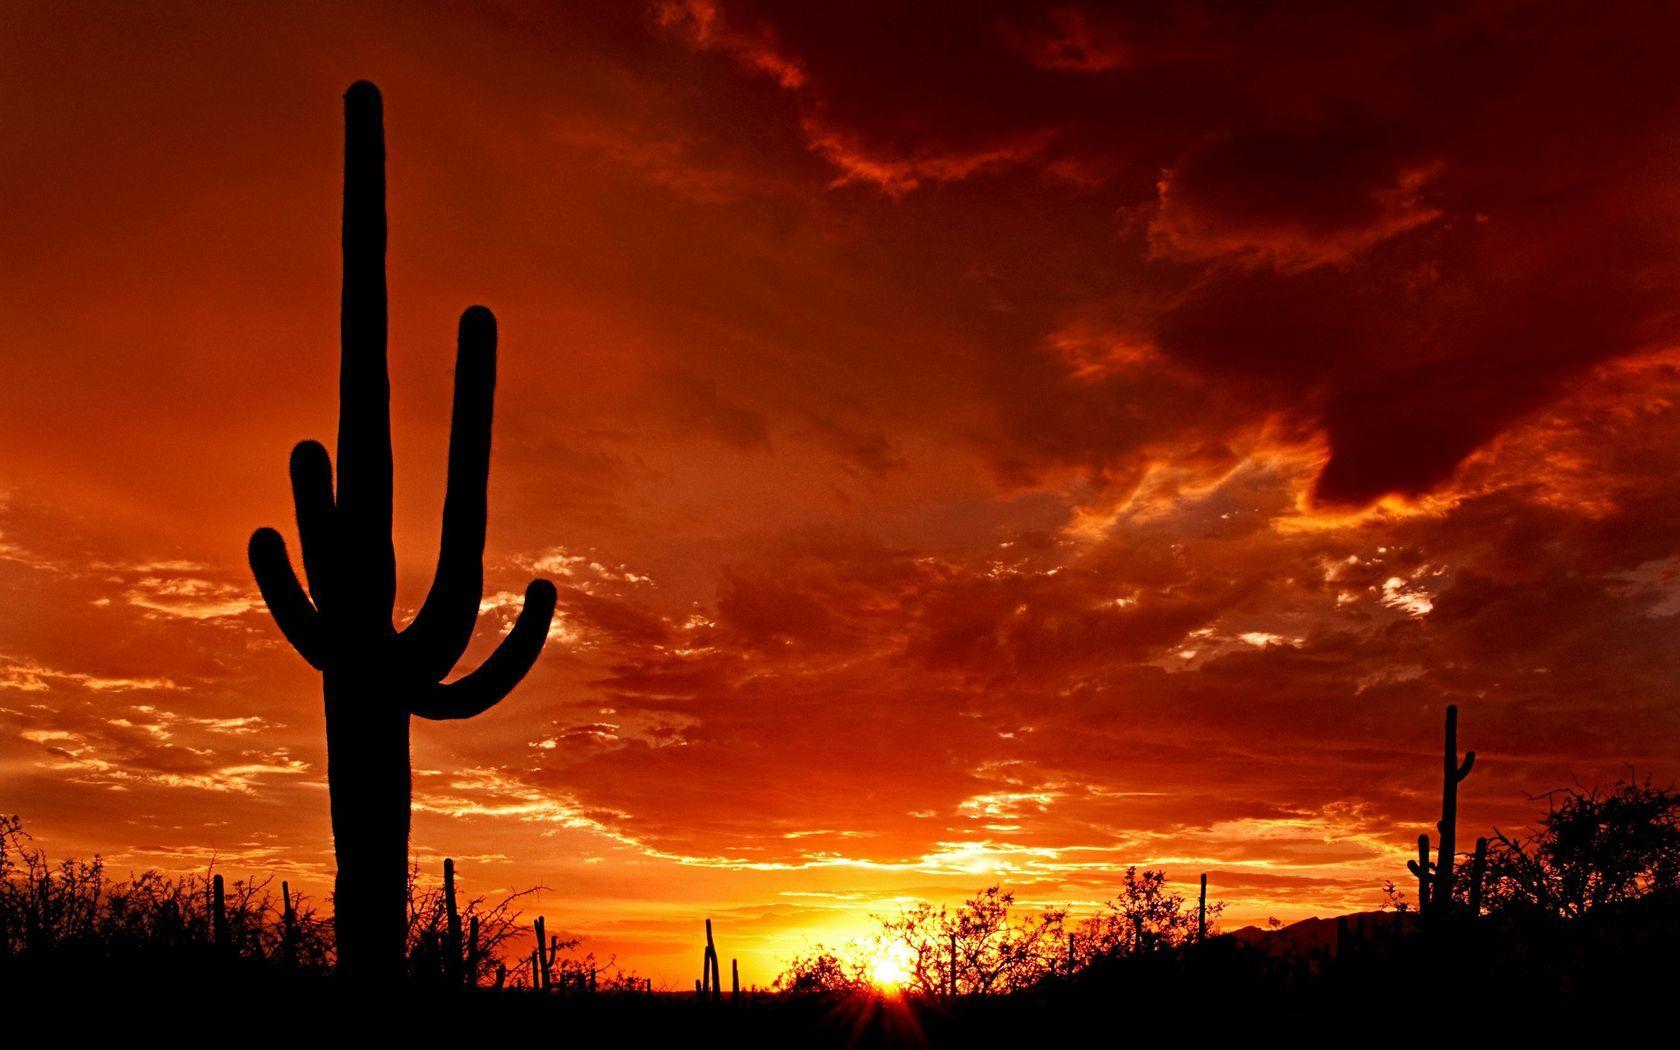 Desert Cactus Wallpaper Hd Wallpaper At Wallpapersmap Com Arizona Sunset Visit Arizona Tucson Arizona Hd wallpaper cacti evening sunset desert